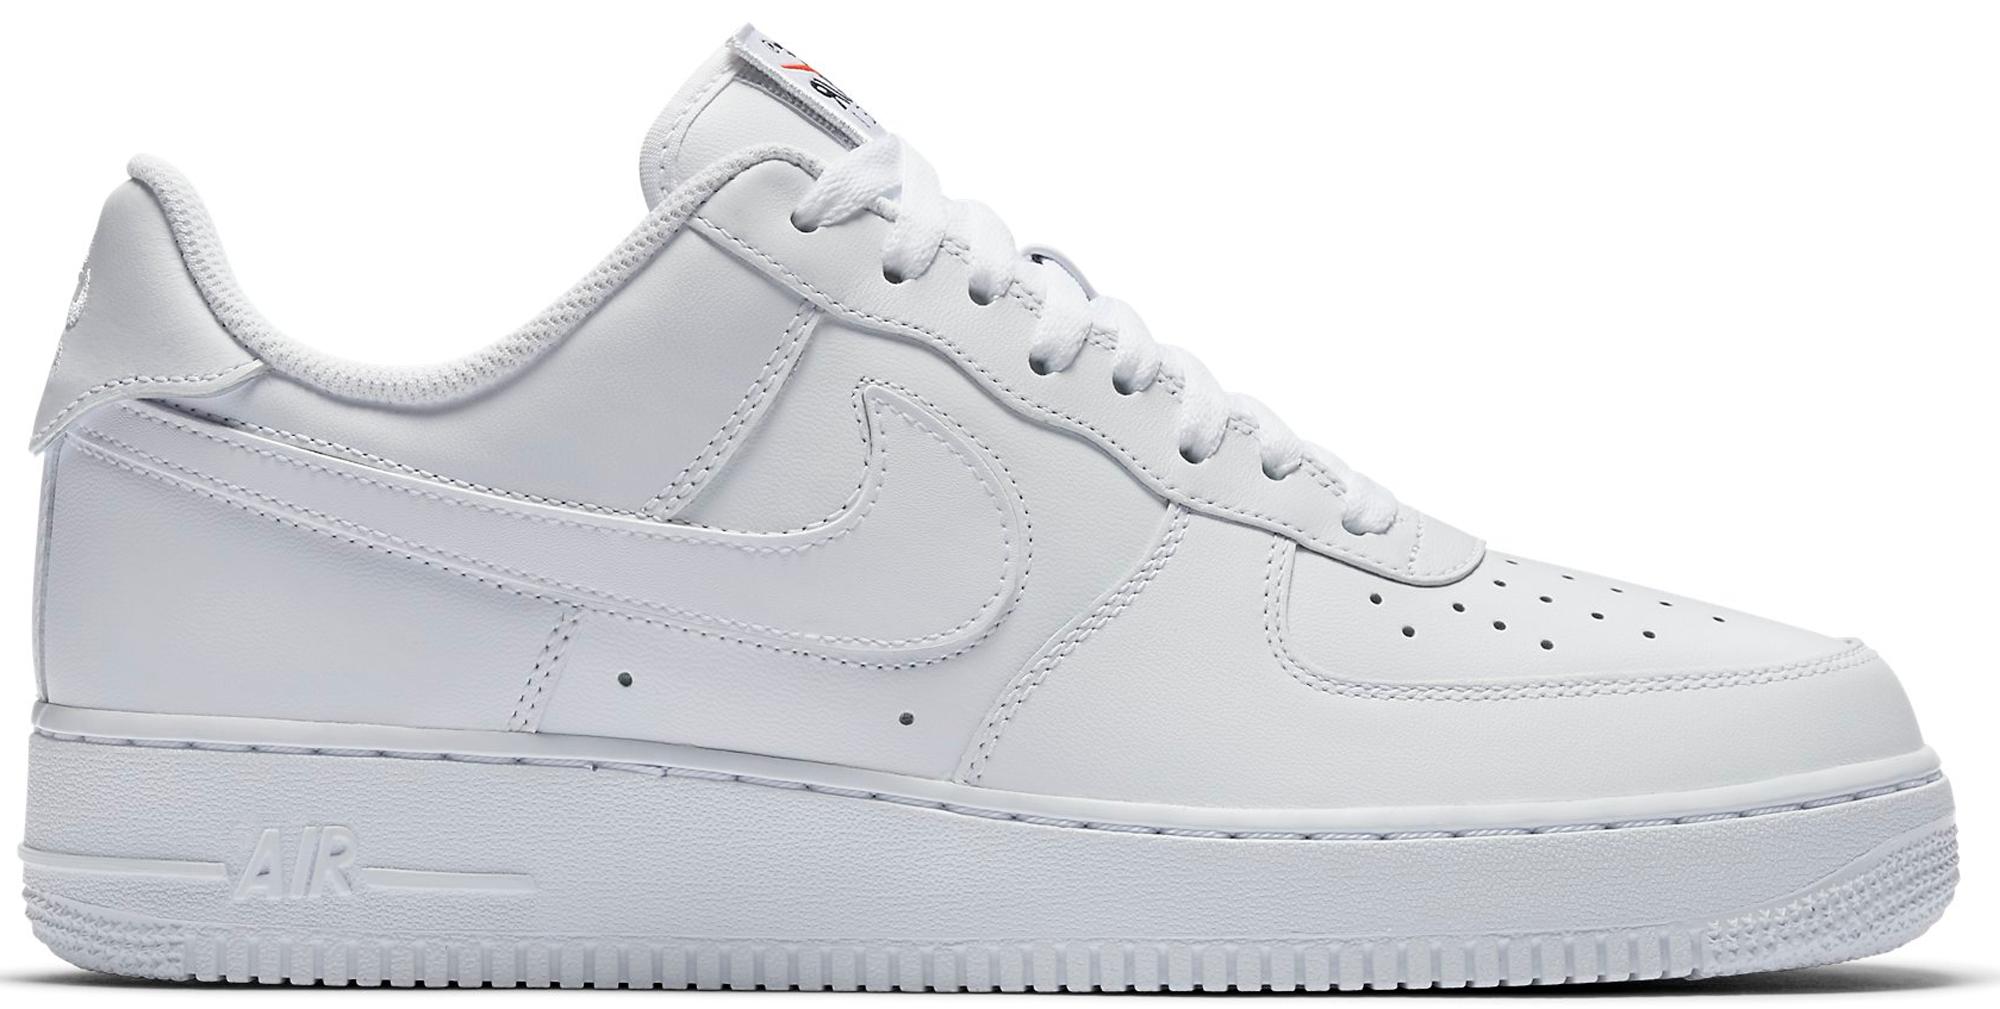 nike air force 1 basse. Modren Air Air Force 1 Low Swoosh Pack AllStar 2018 White With Nike Basse